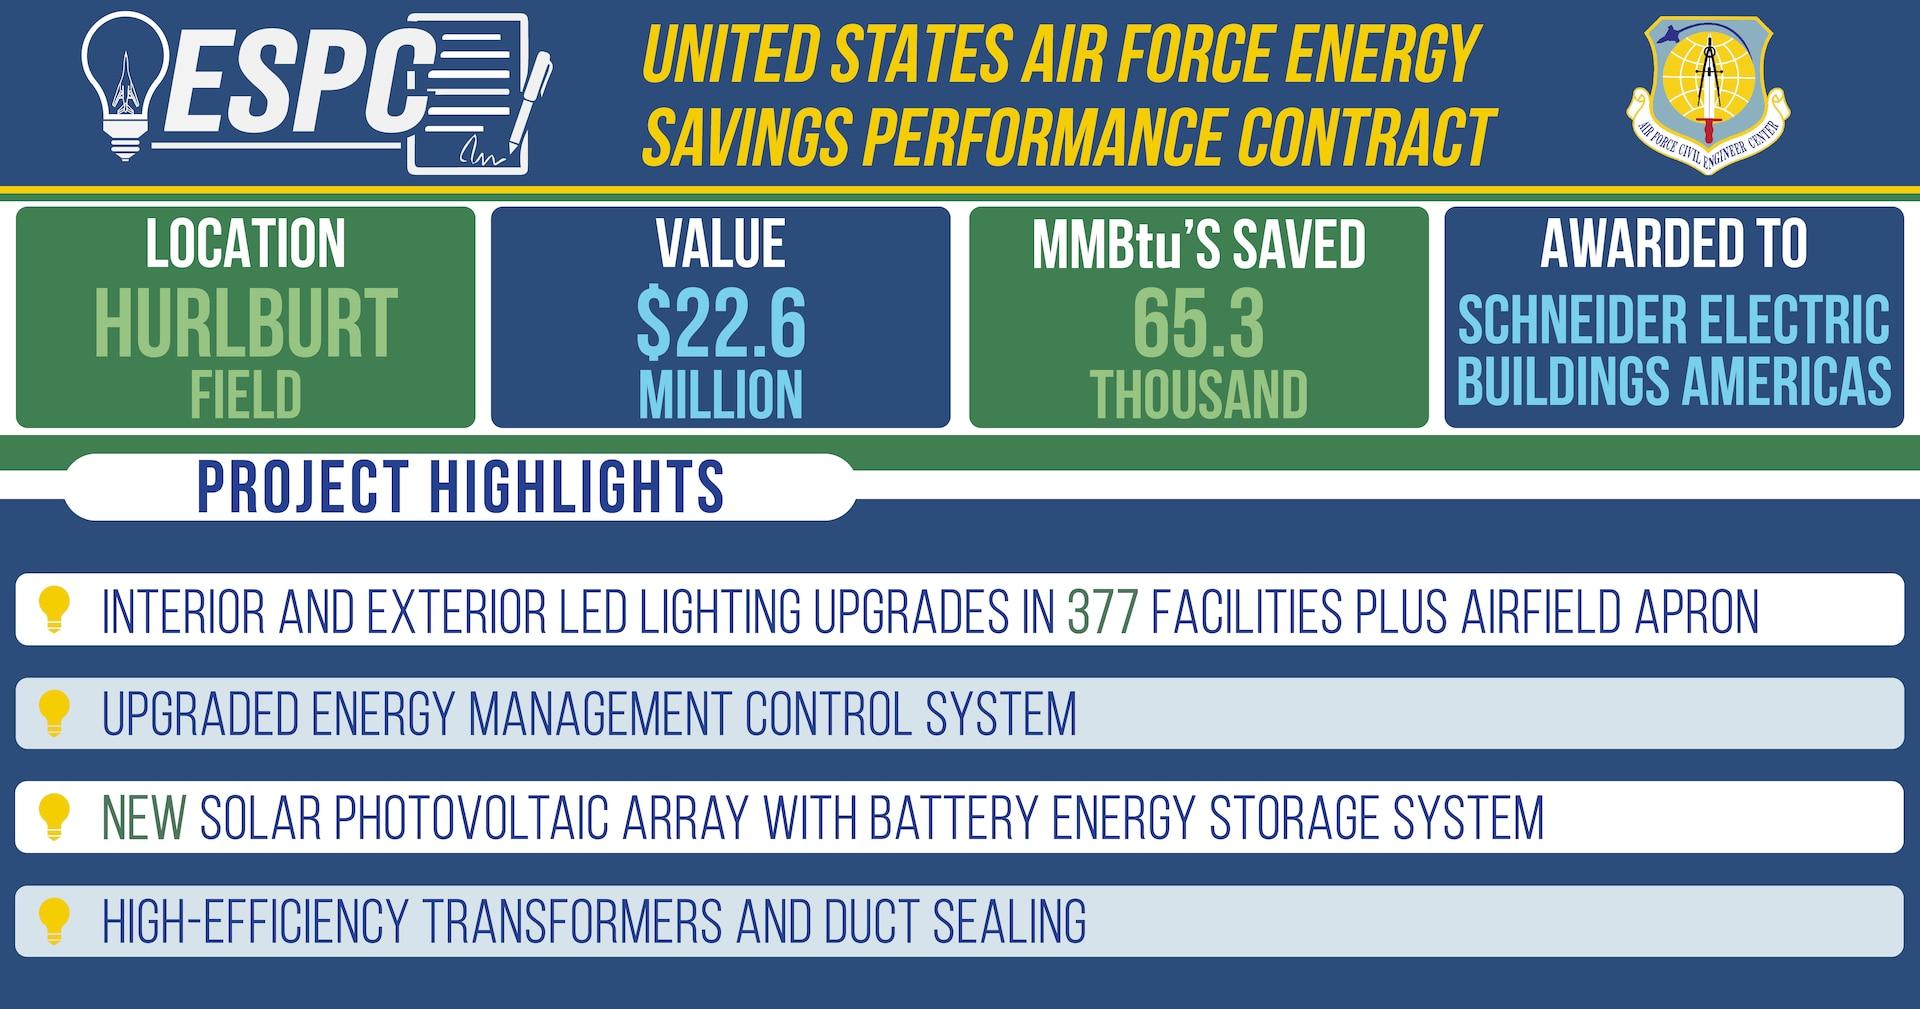 graphic showing expected benefits of ESPC at Hurlburt Field, Florida.